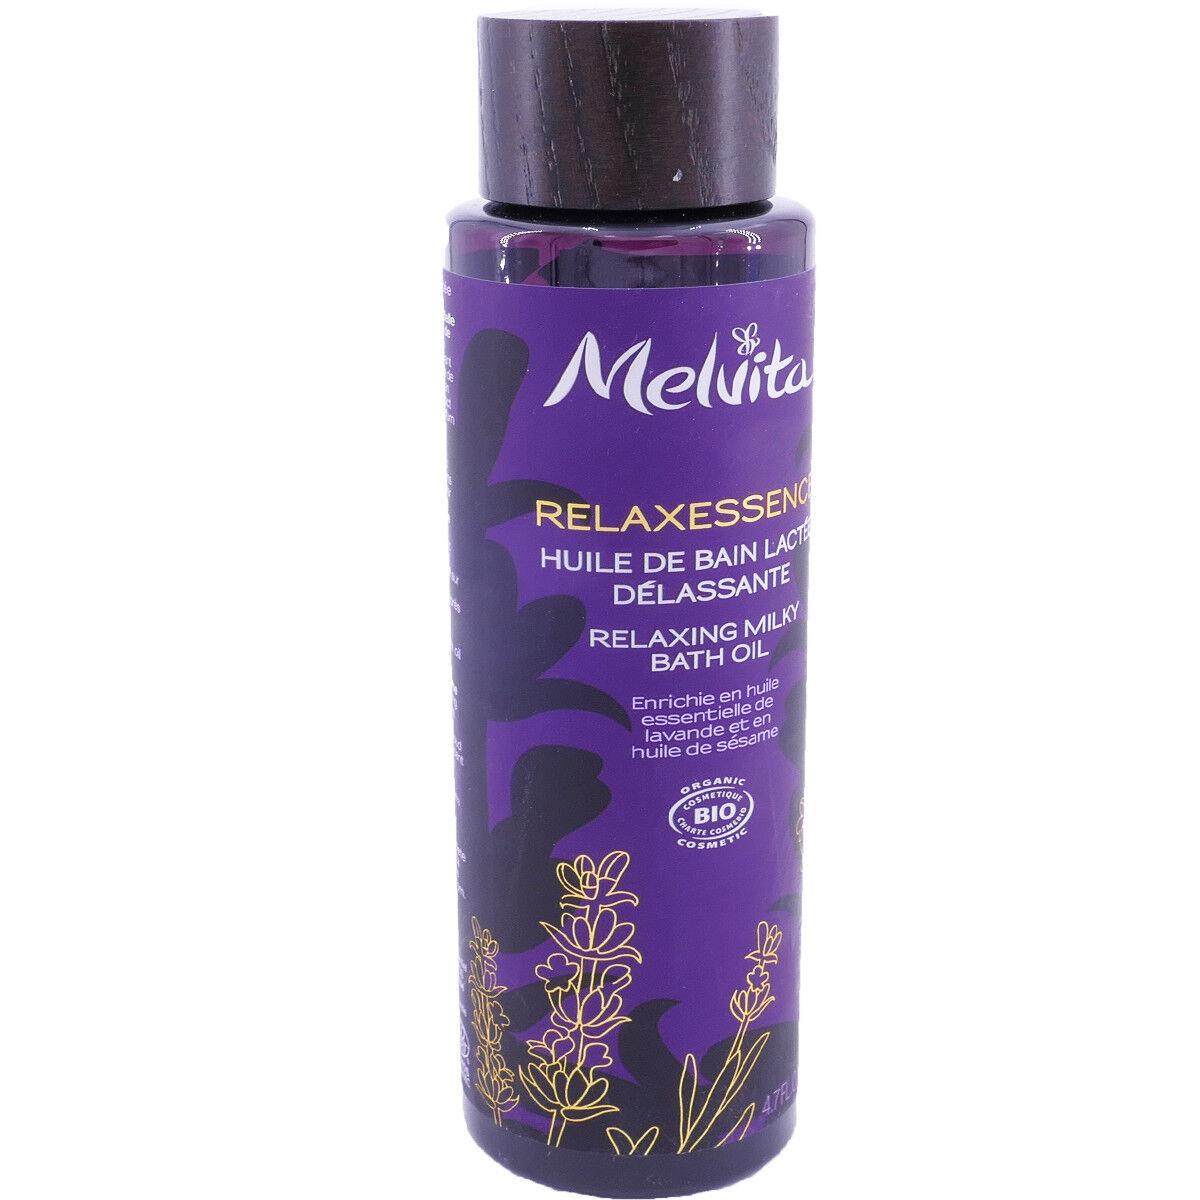 Melvita relaxessence huile de bain 140 ml